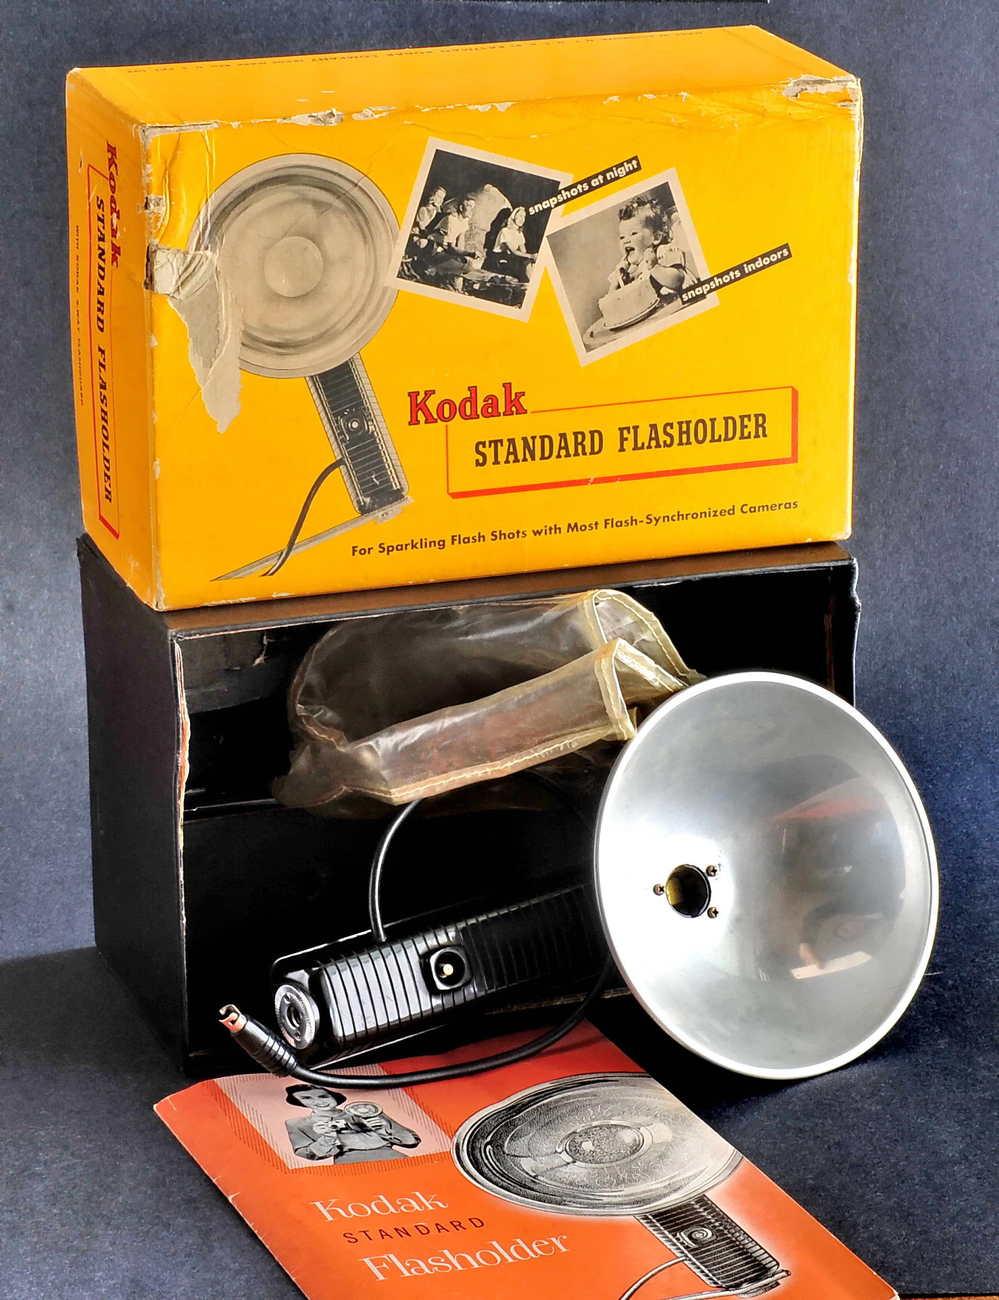 Kodak standard flasholder w box.small file